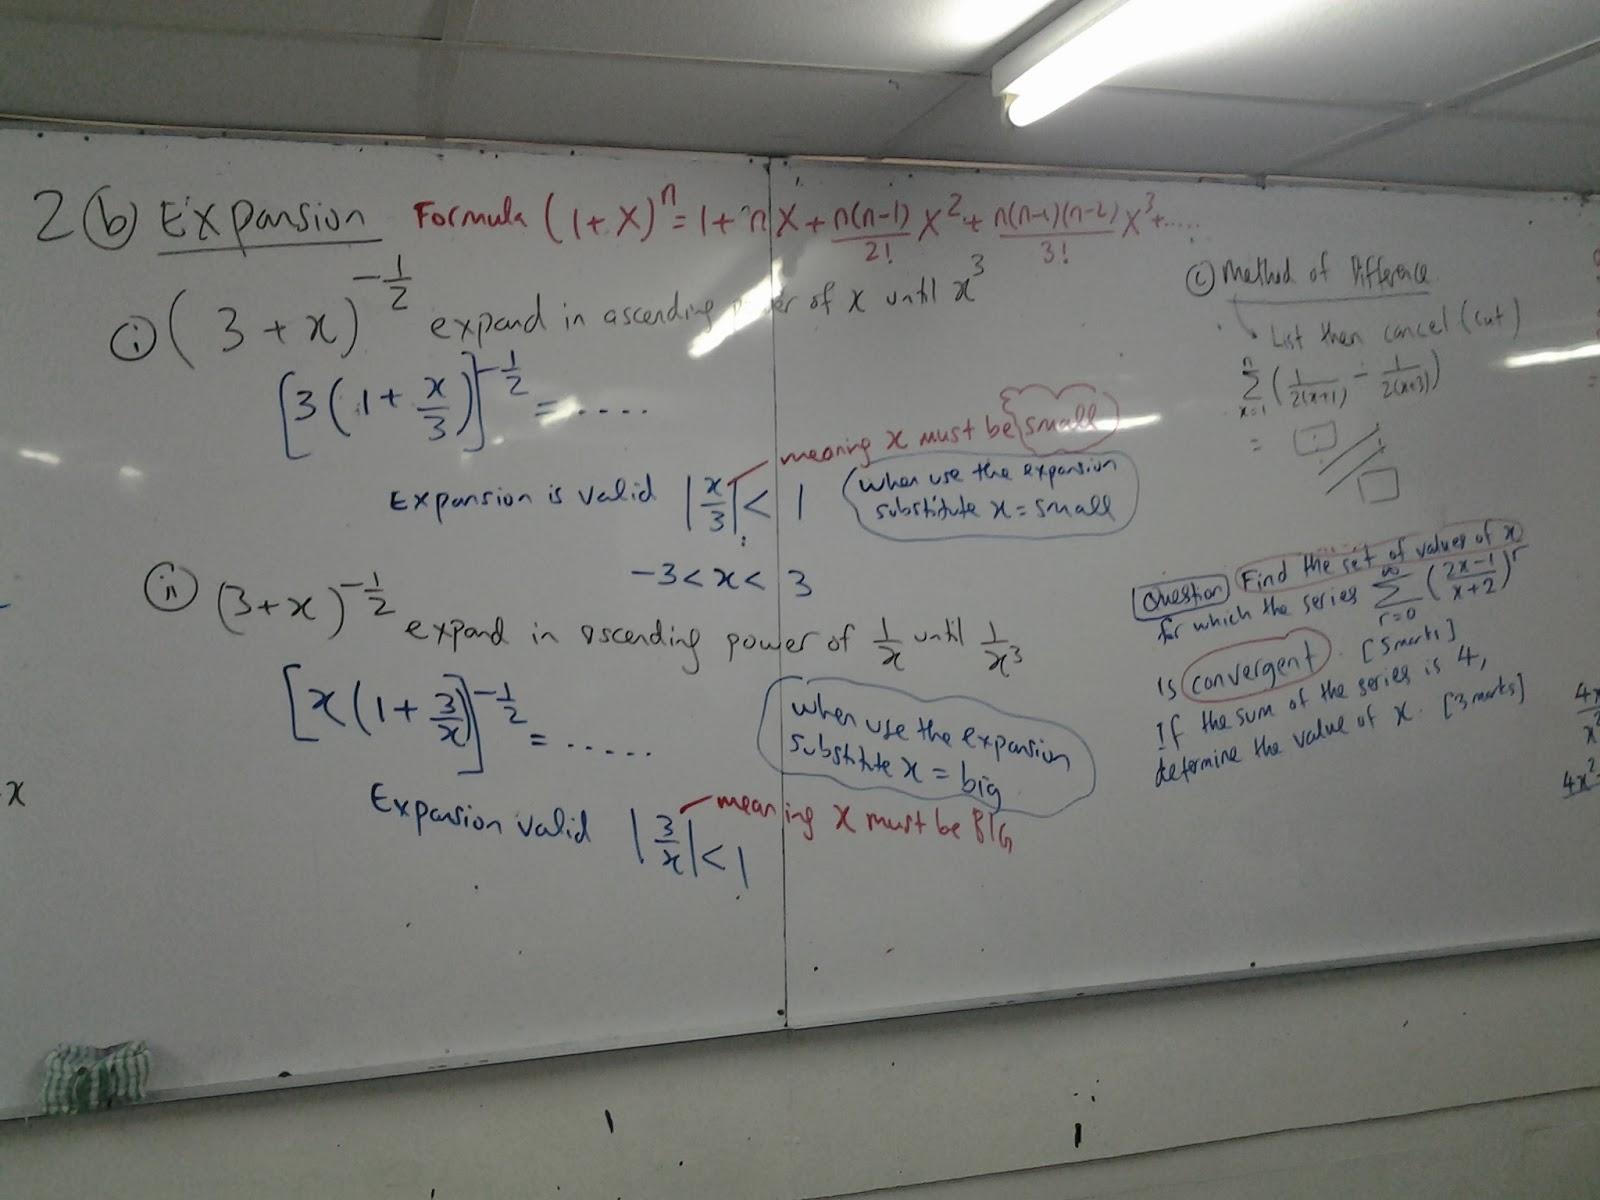 mathematics t coursework stpm 2014 Mars t coursework stpm 2014 sem 3  mathematics t coursework stpm 2016  ami coursework for stpm mathematics t coursework 2016 answer 1 stpm 2017 math t.